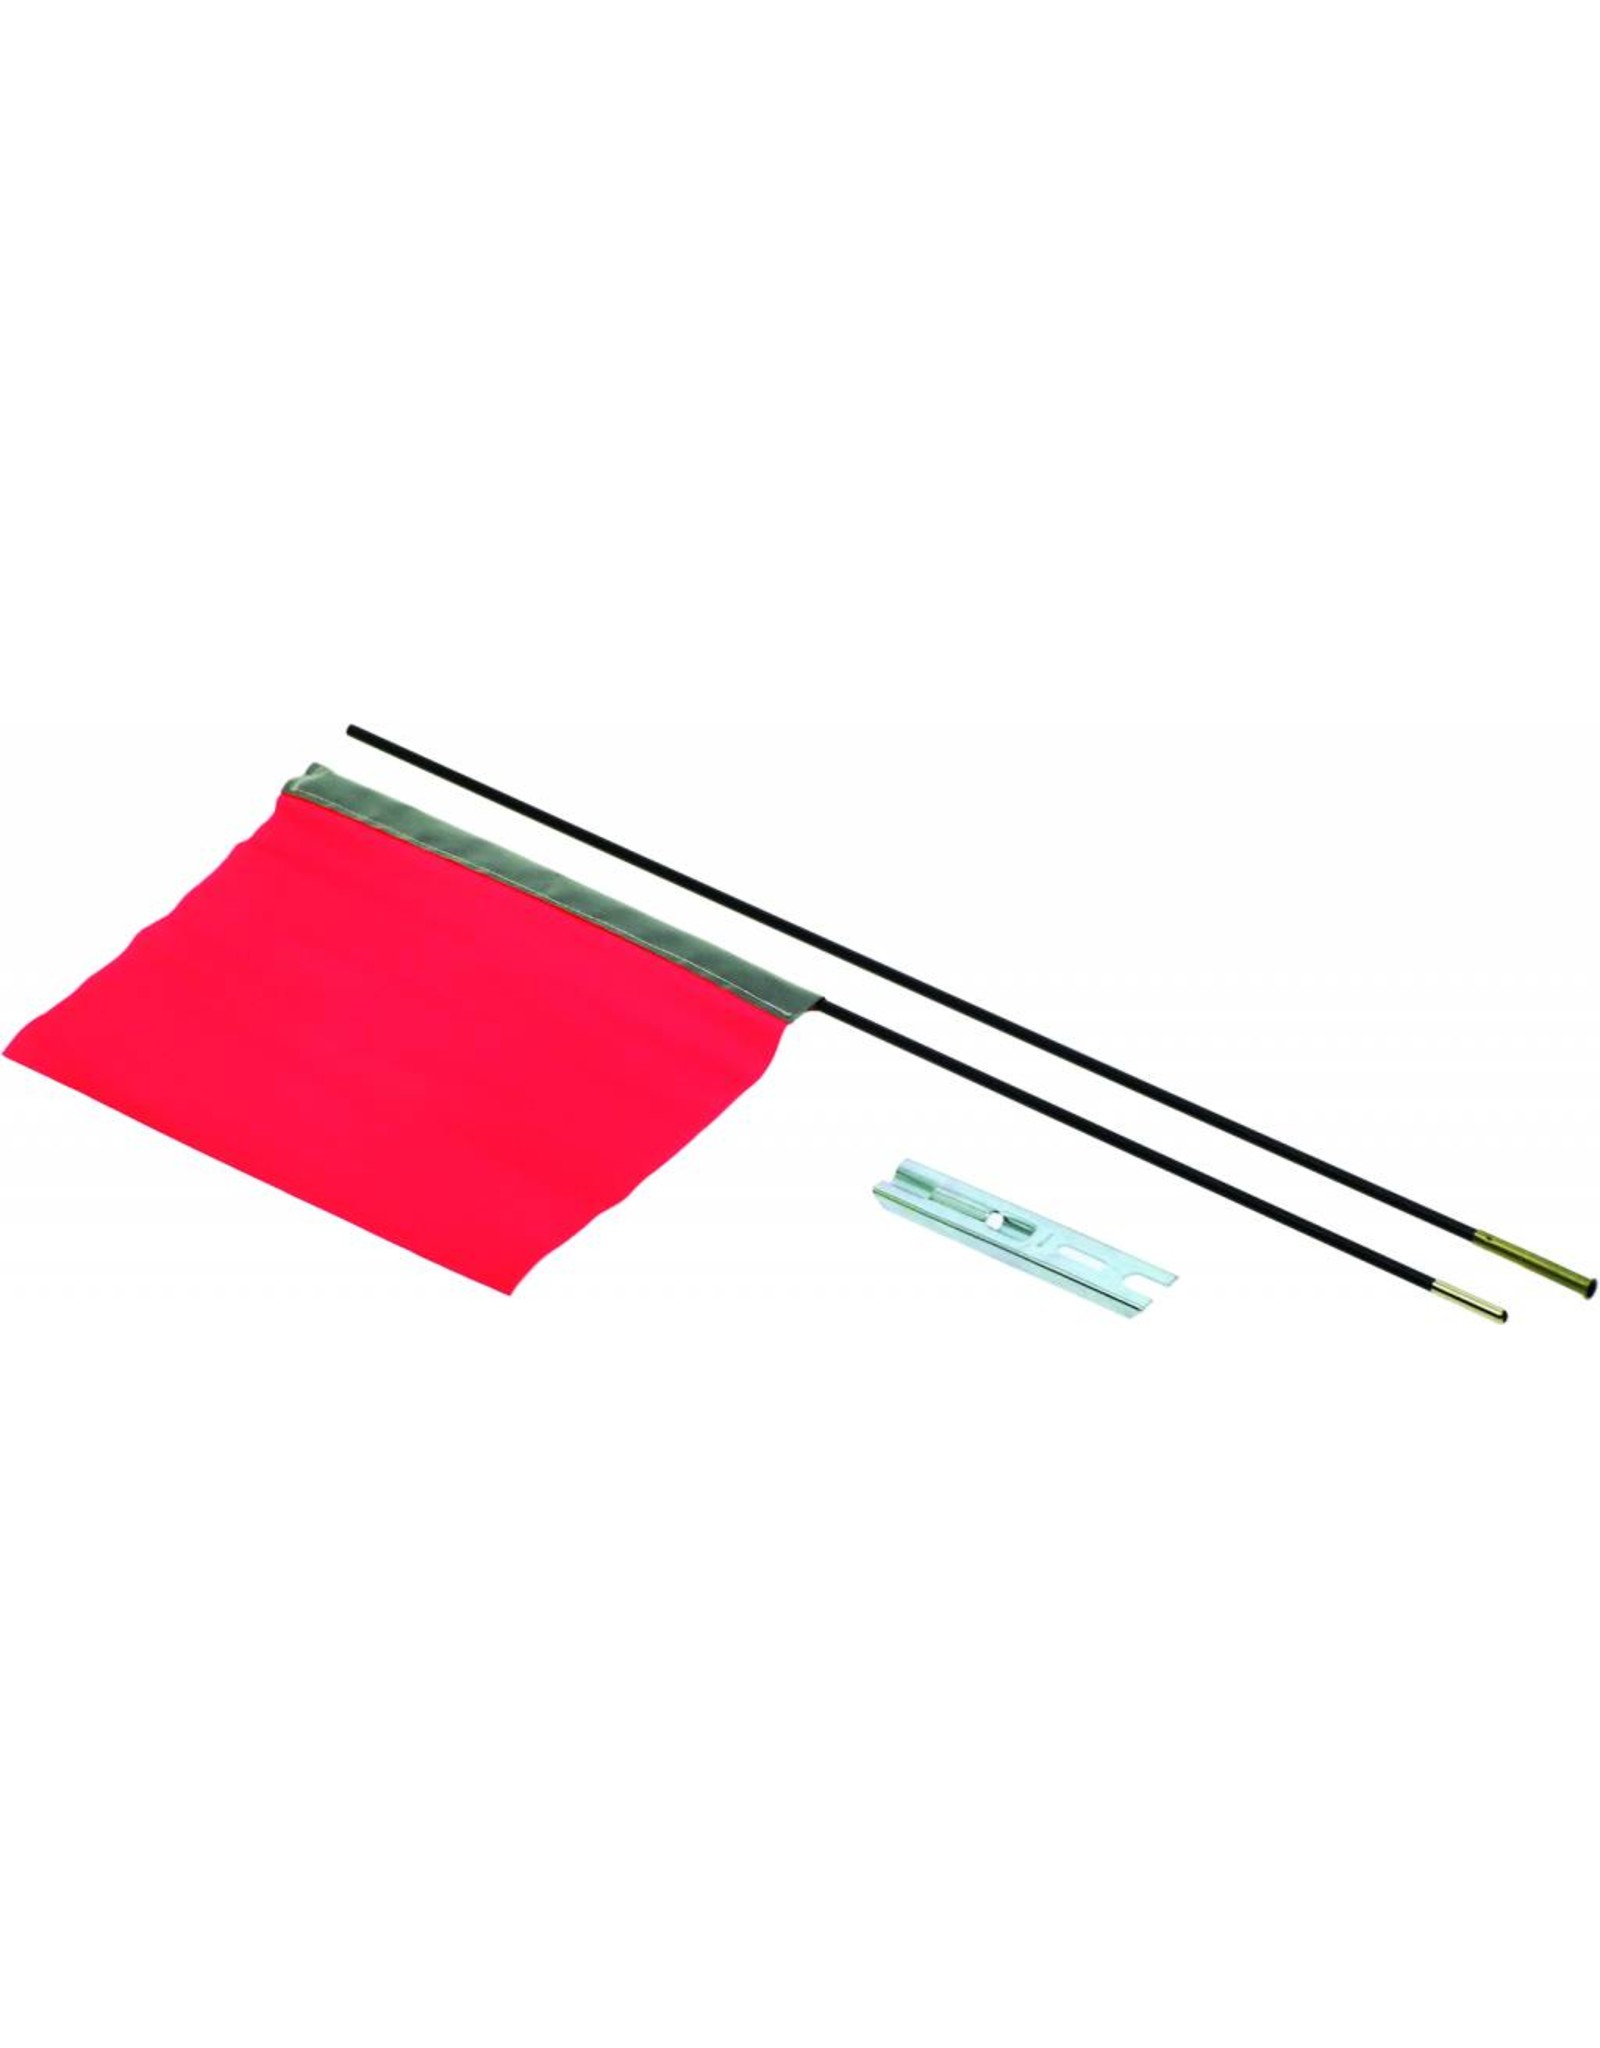 49N 49n Safety Flag